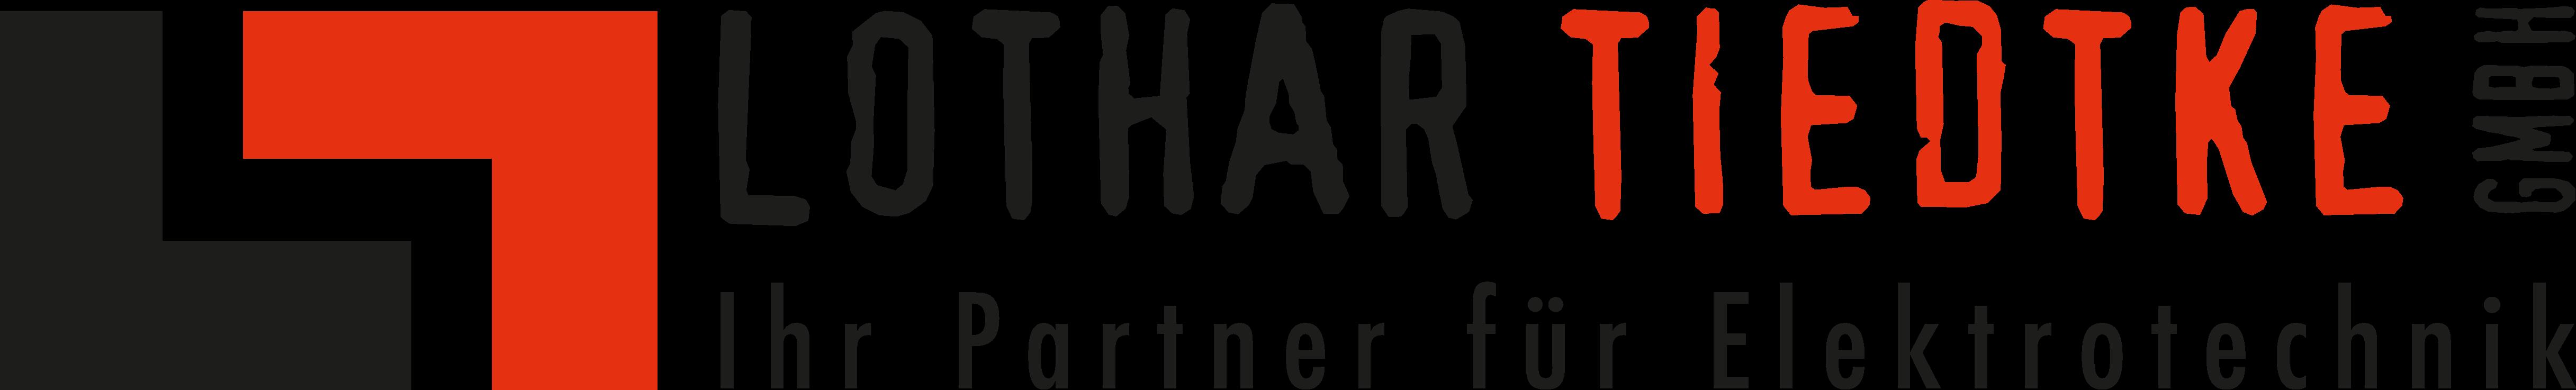 Lothar Tiedtke GmbH